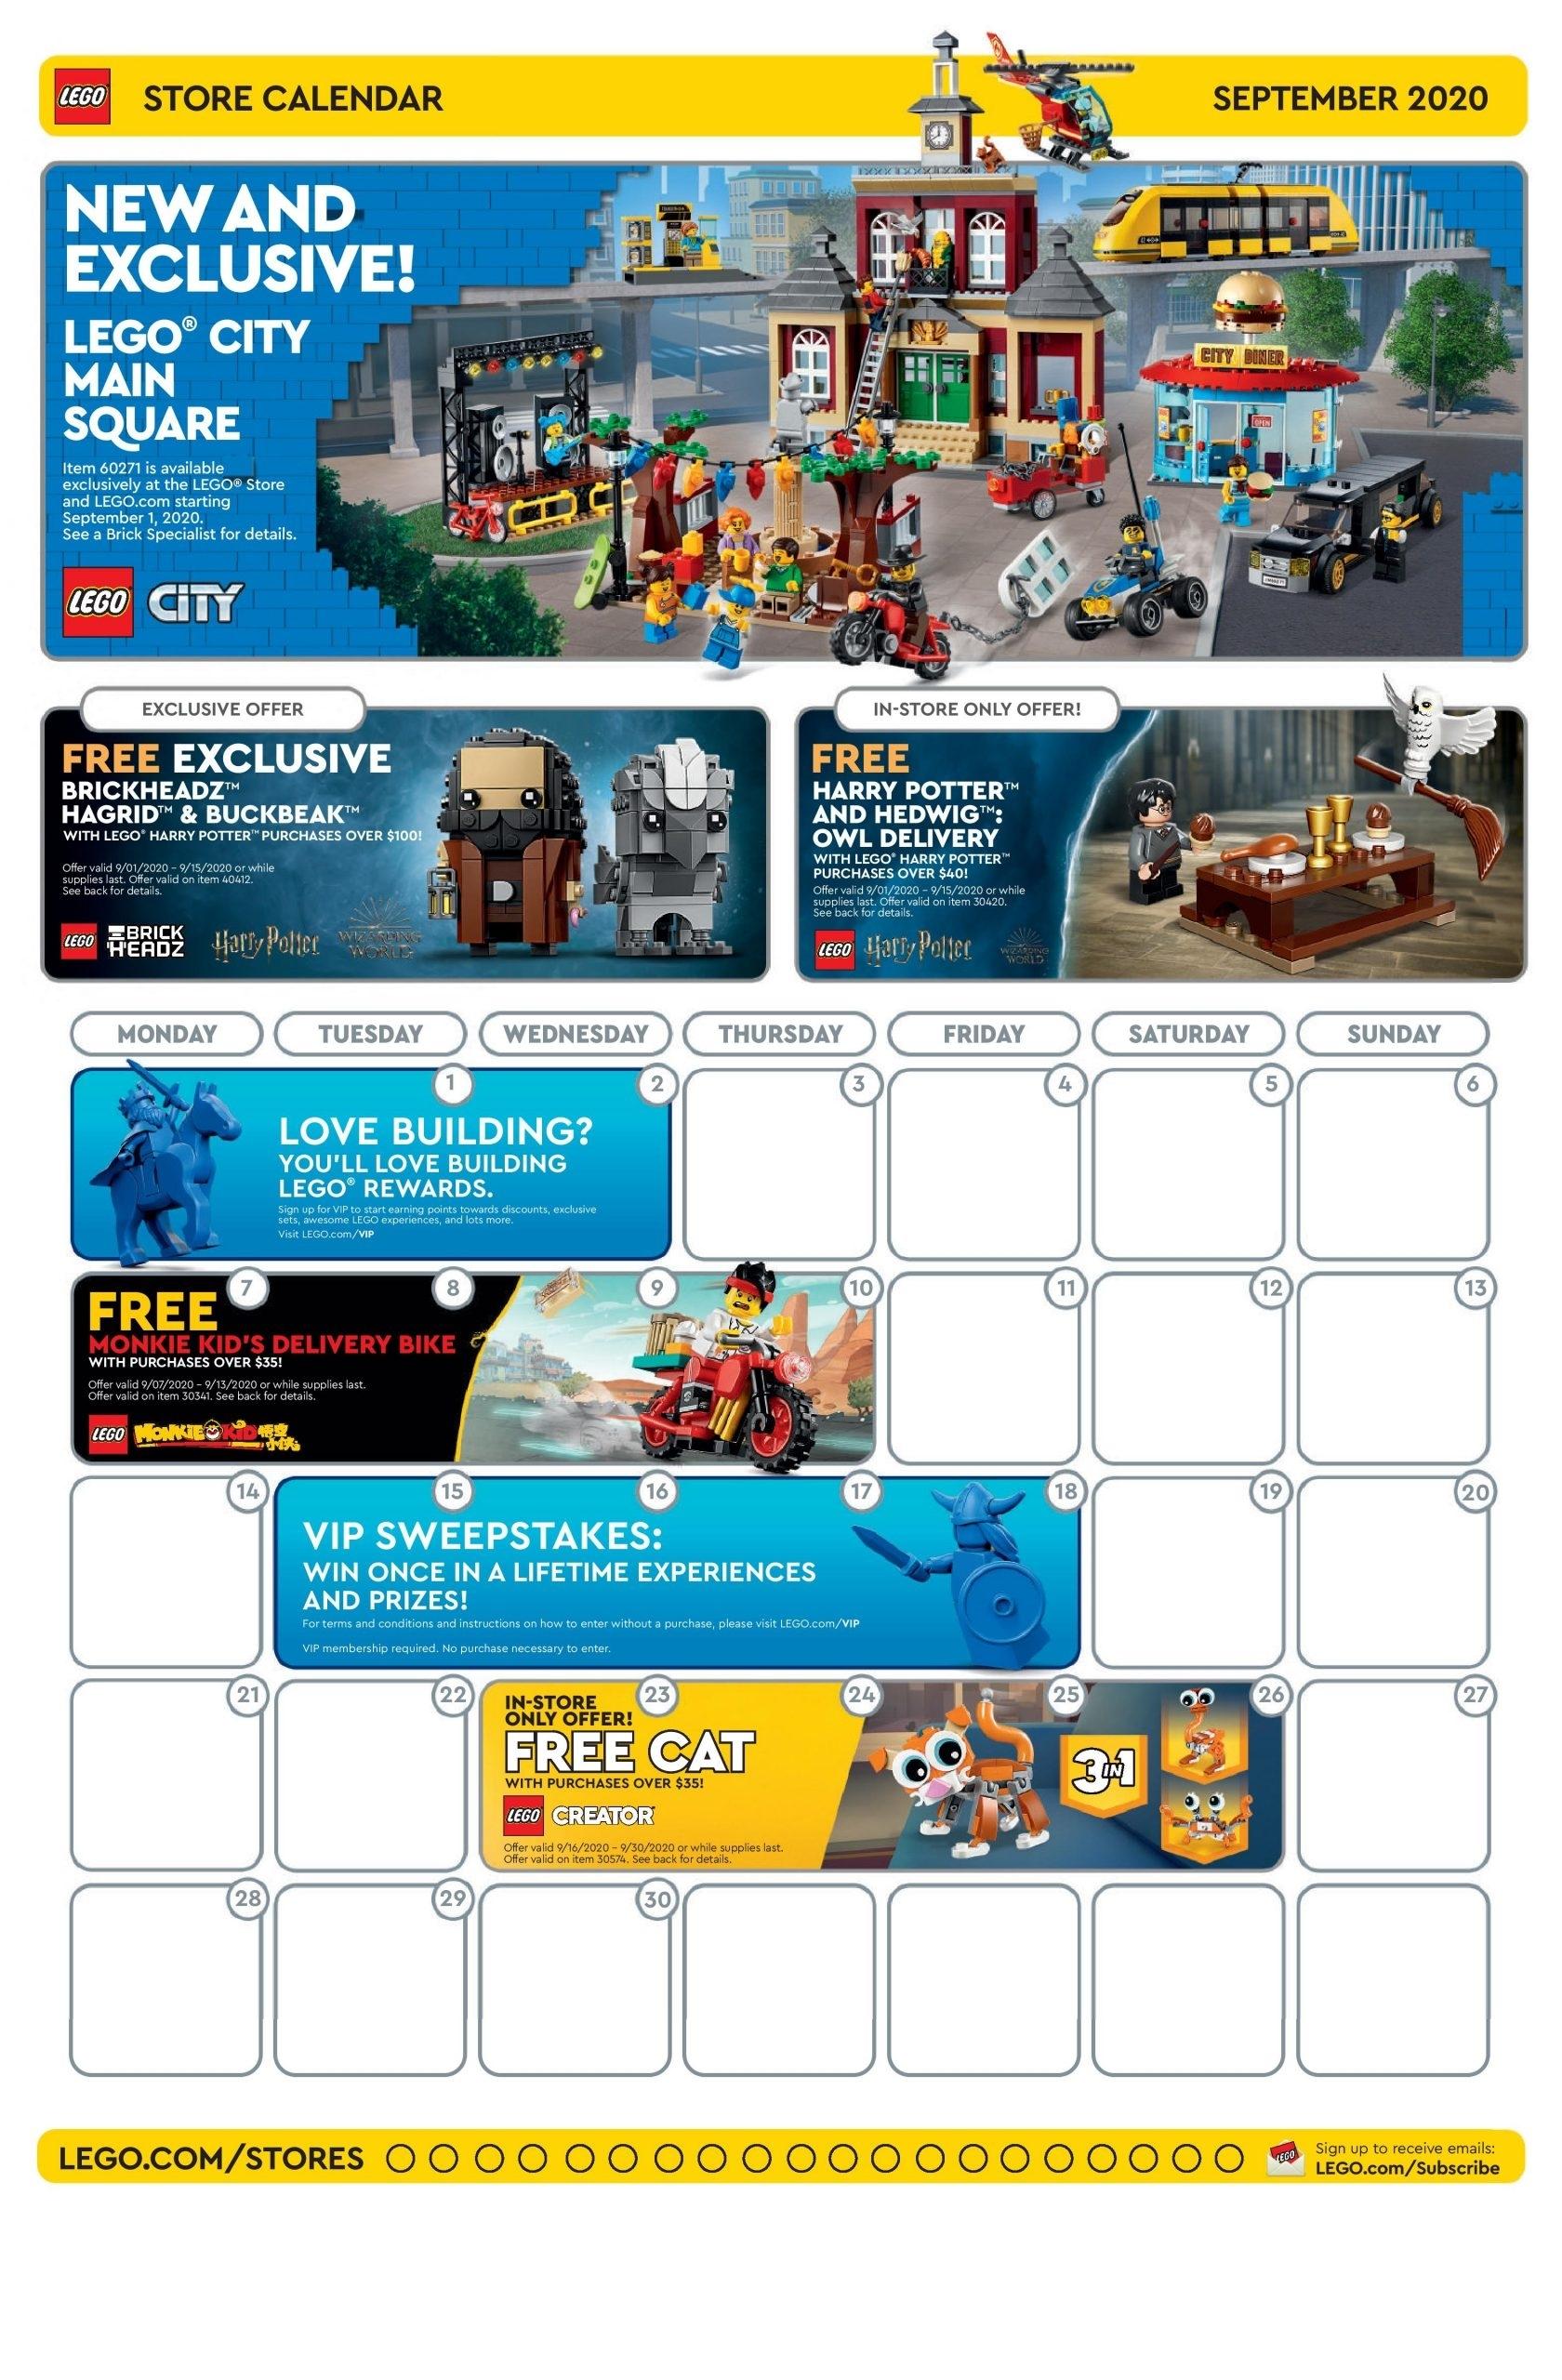 Catch Lego Starwars Event Calendar Free Code